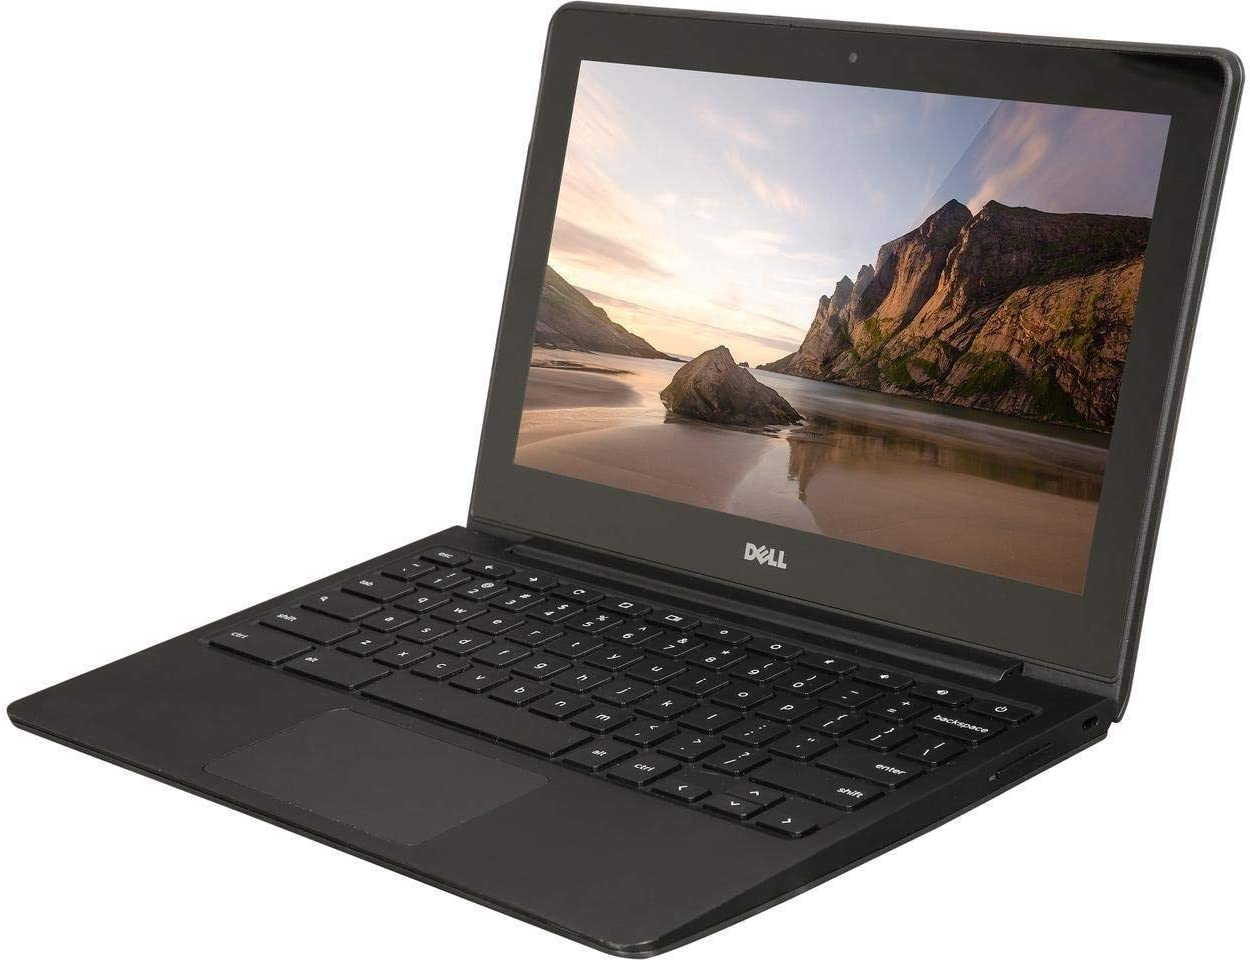 Dell ChromeBook 11 4GB Ram, 16GB SSD (2.1 ghz) (Renewed)